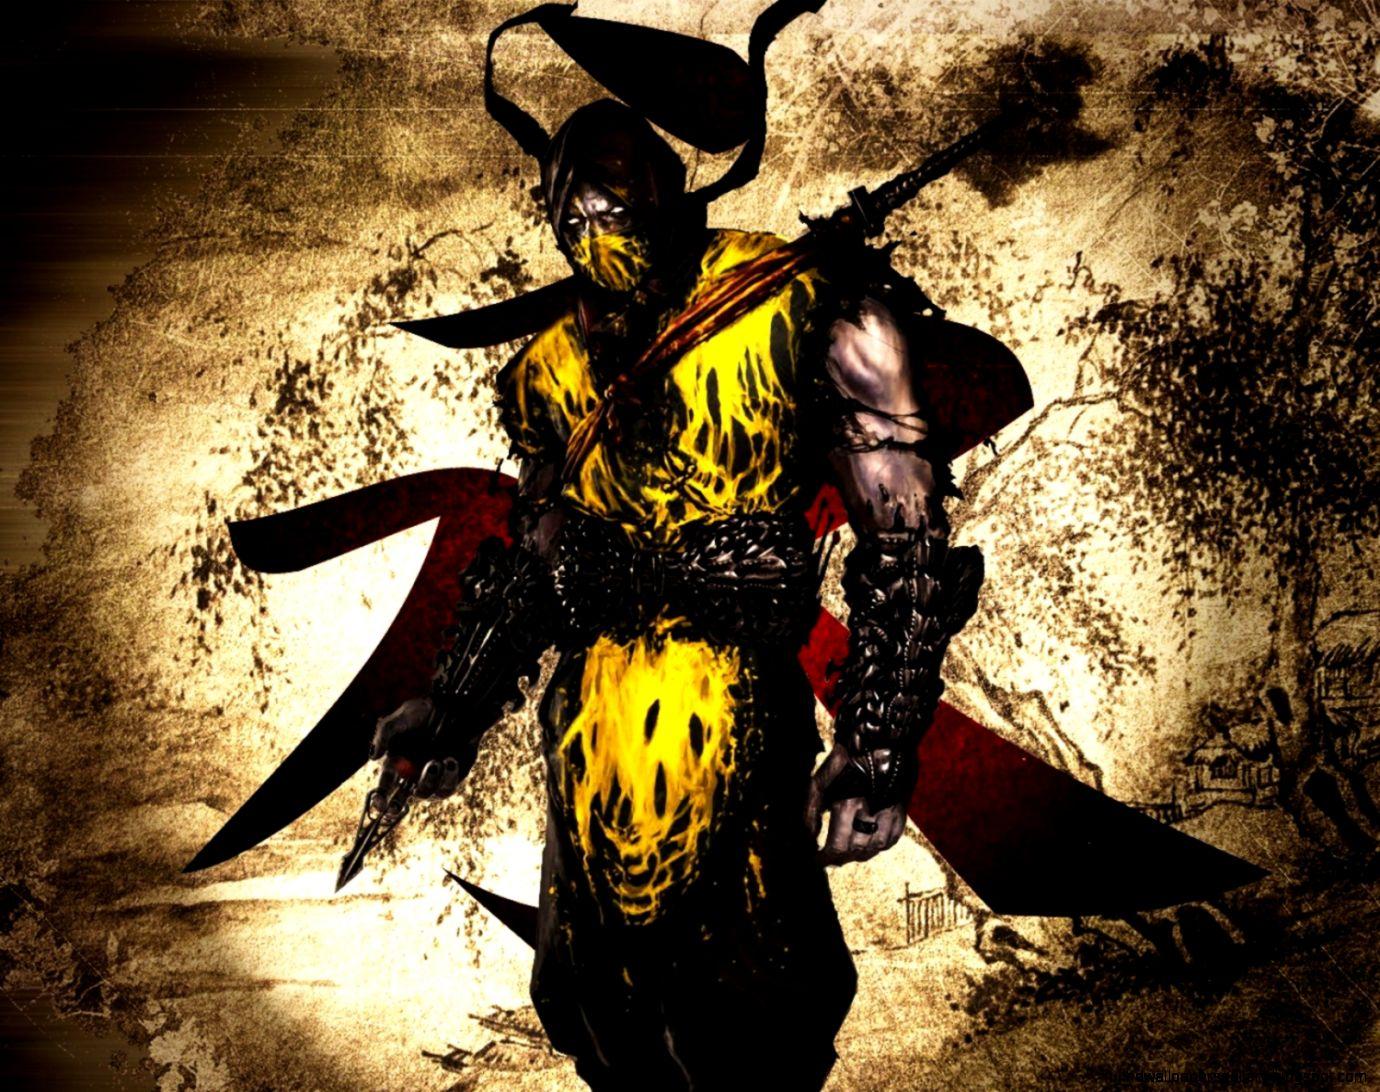 Mortal Kombat Scorpion Wallpapers